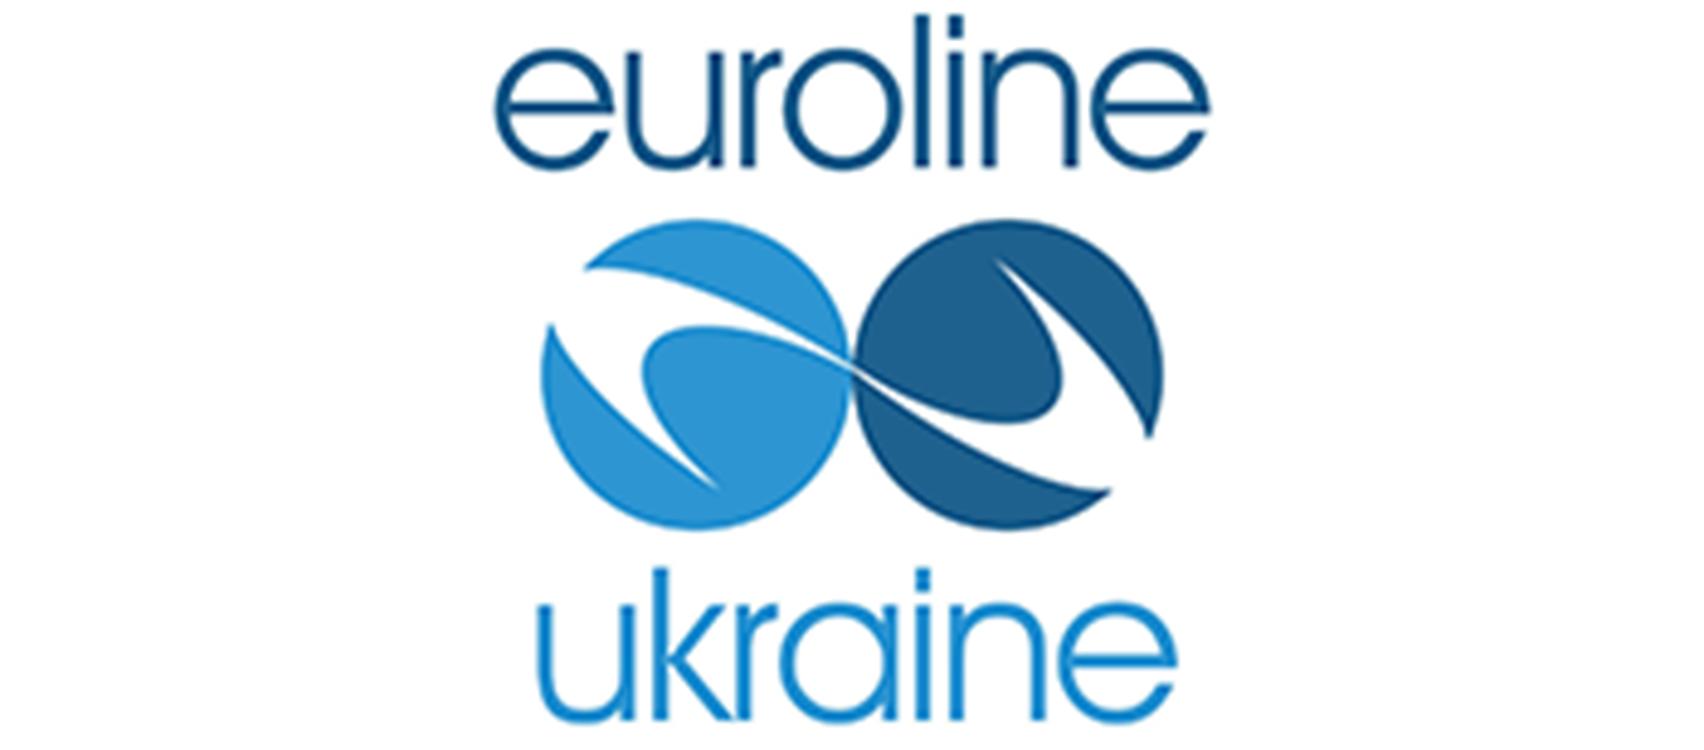 Euroline Ukraine